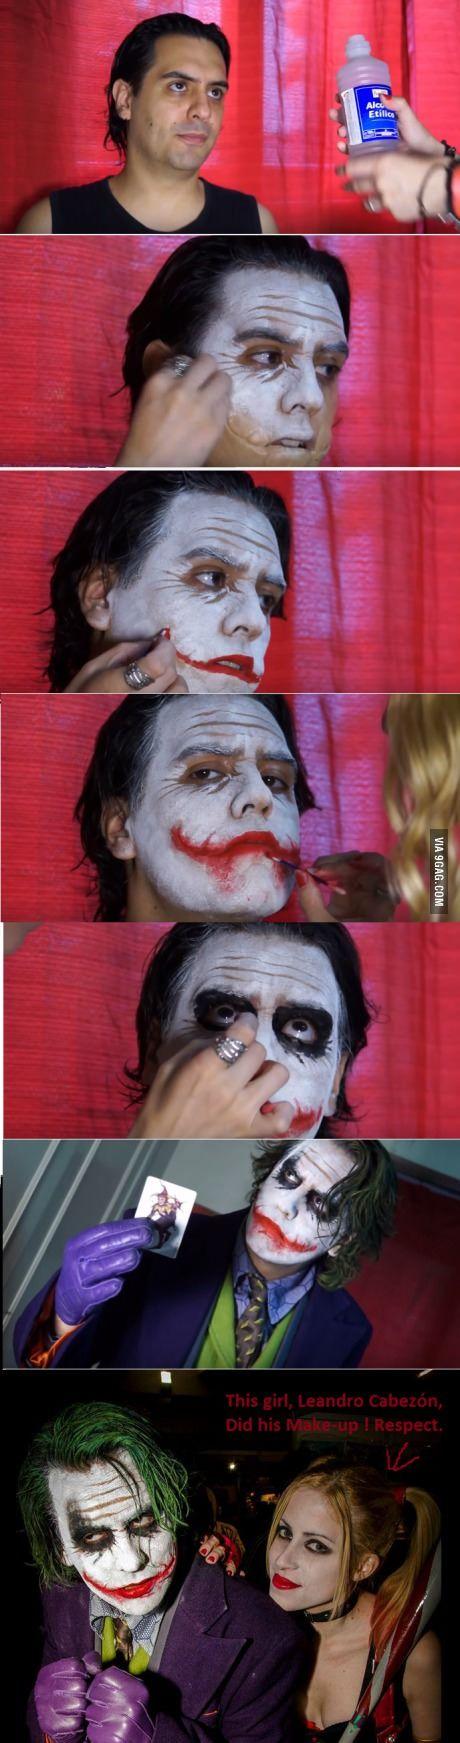 Amazing Joker Cosplay, make-up by Leandro Cabezón.                                                                                                                                                                                 Mehr